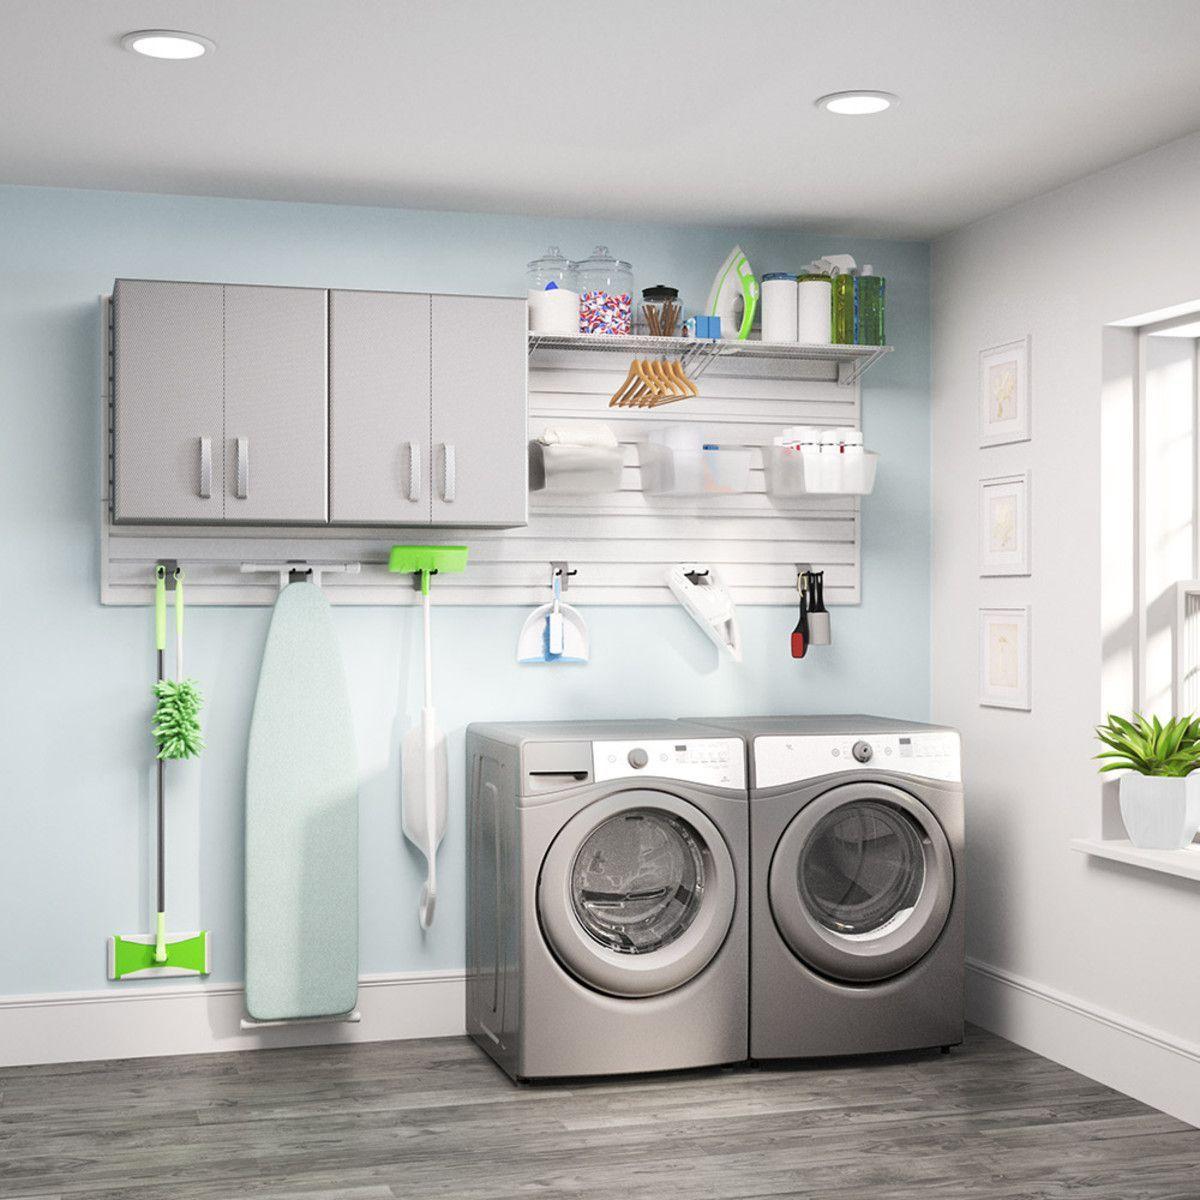 30 space saving laundry room ideas with well organizing storage rh pinterest com